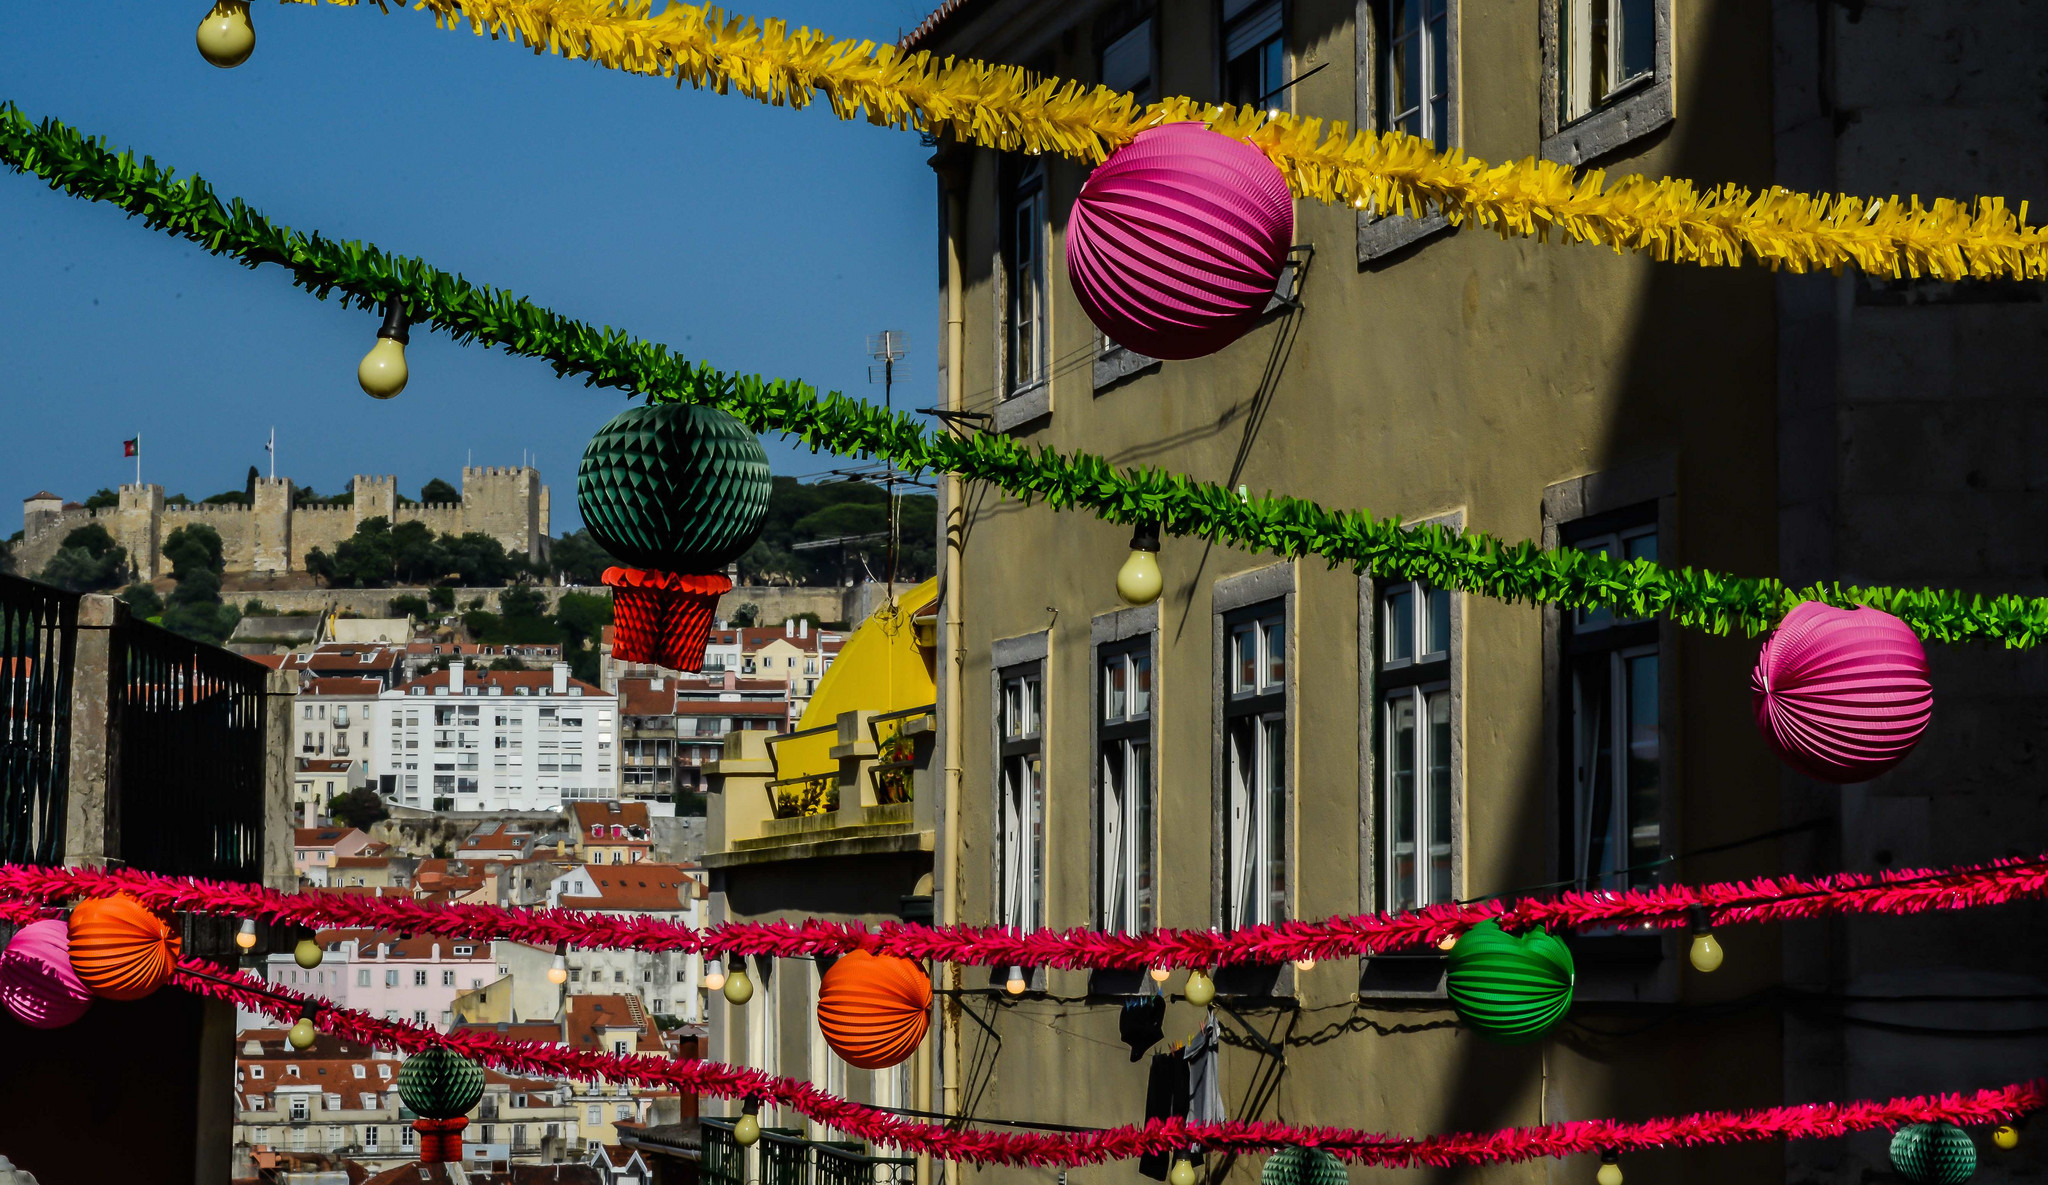 festas de lisboa_streets and castle_jose frade.jpg